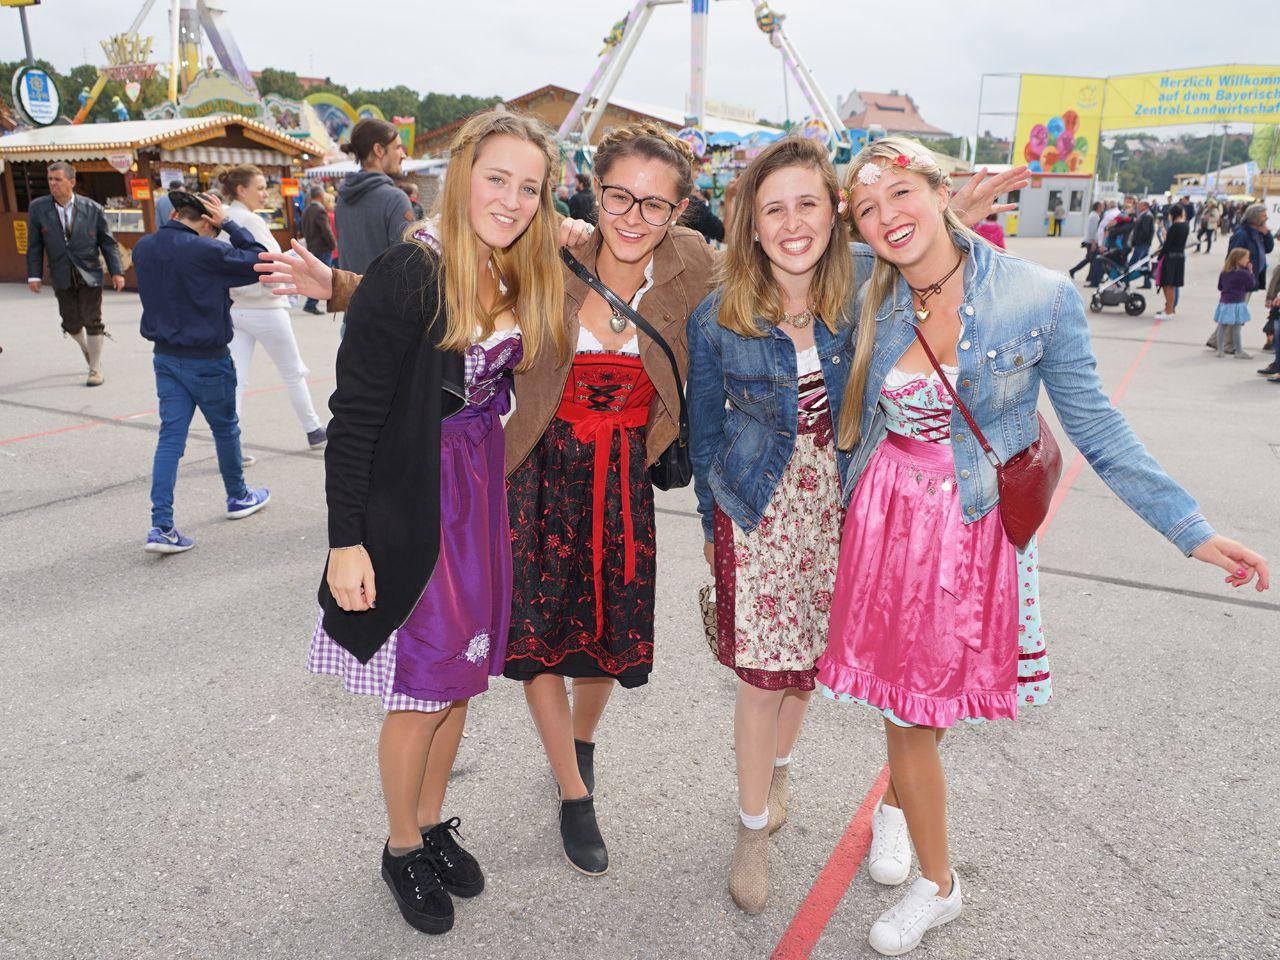 premium selection bb70e b694f Mode für das Oktoberfest: Dirndl, Lederhosen München